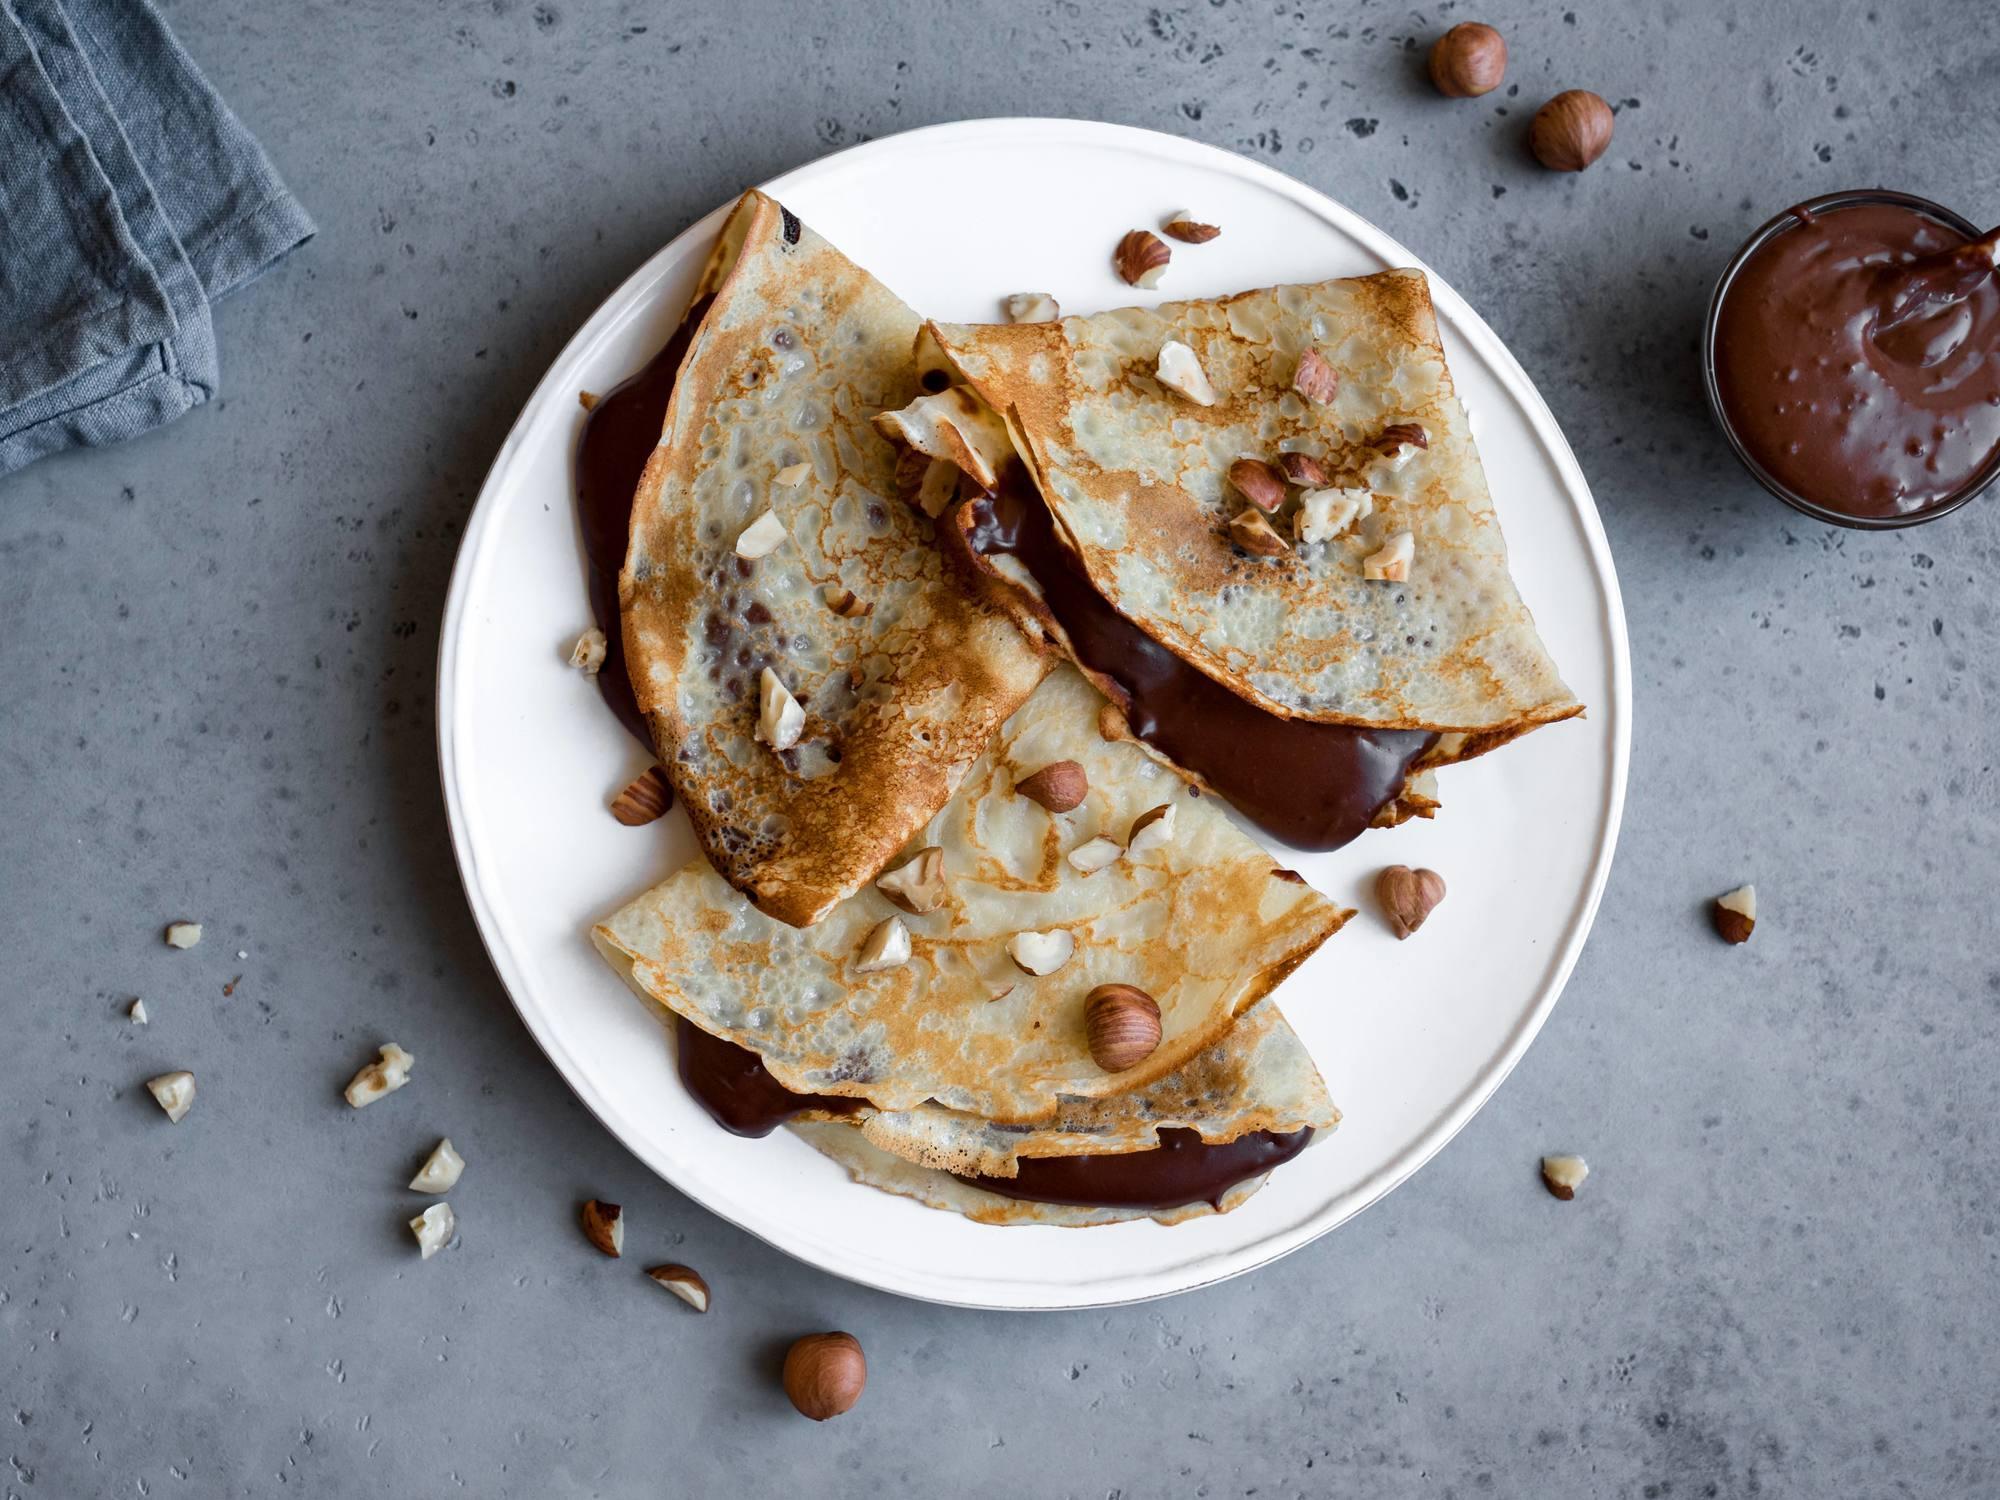 Crêpes sauce chococo sans gluten